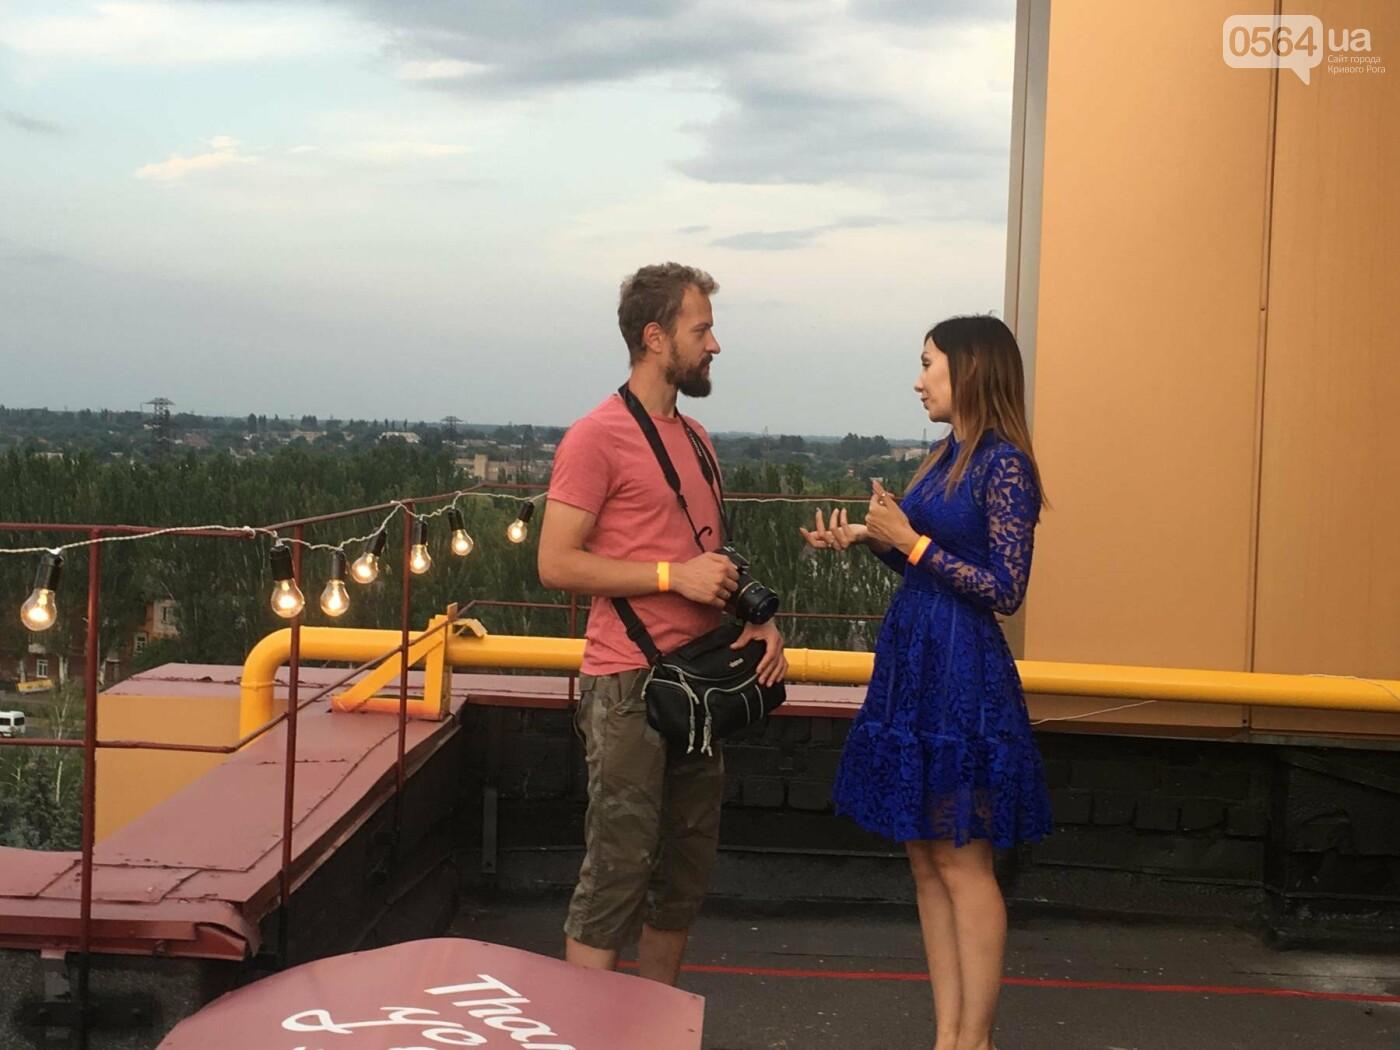 Сотни криворожан встречали закат на крыше отеля под мелодии джаза, - ФОТО, ВИДЕО, фото-15